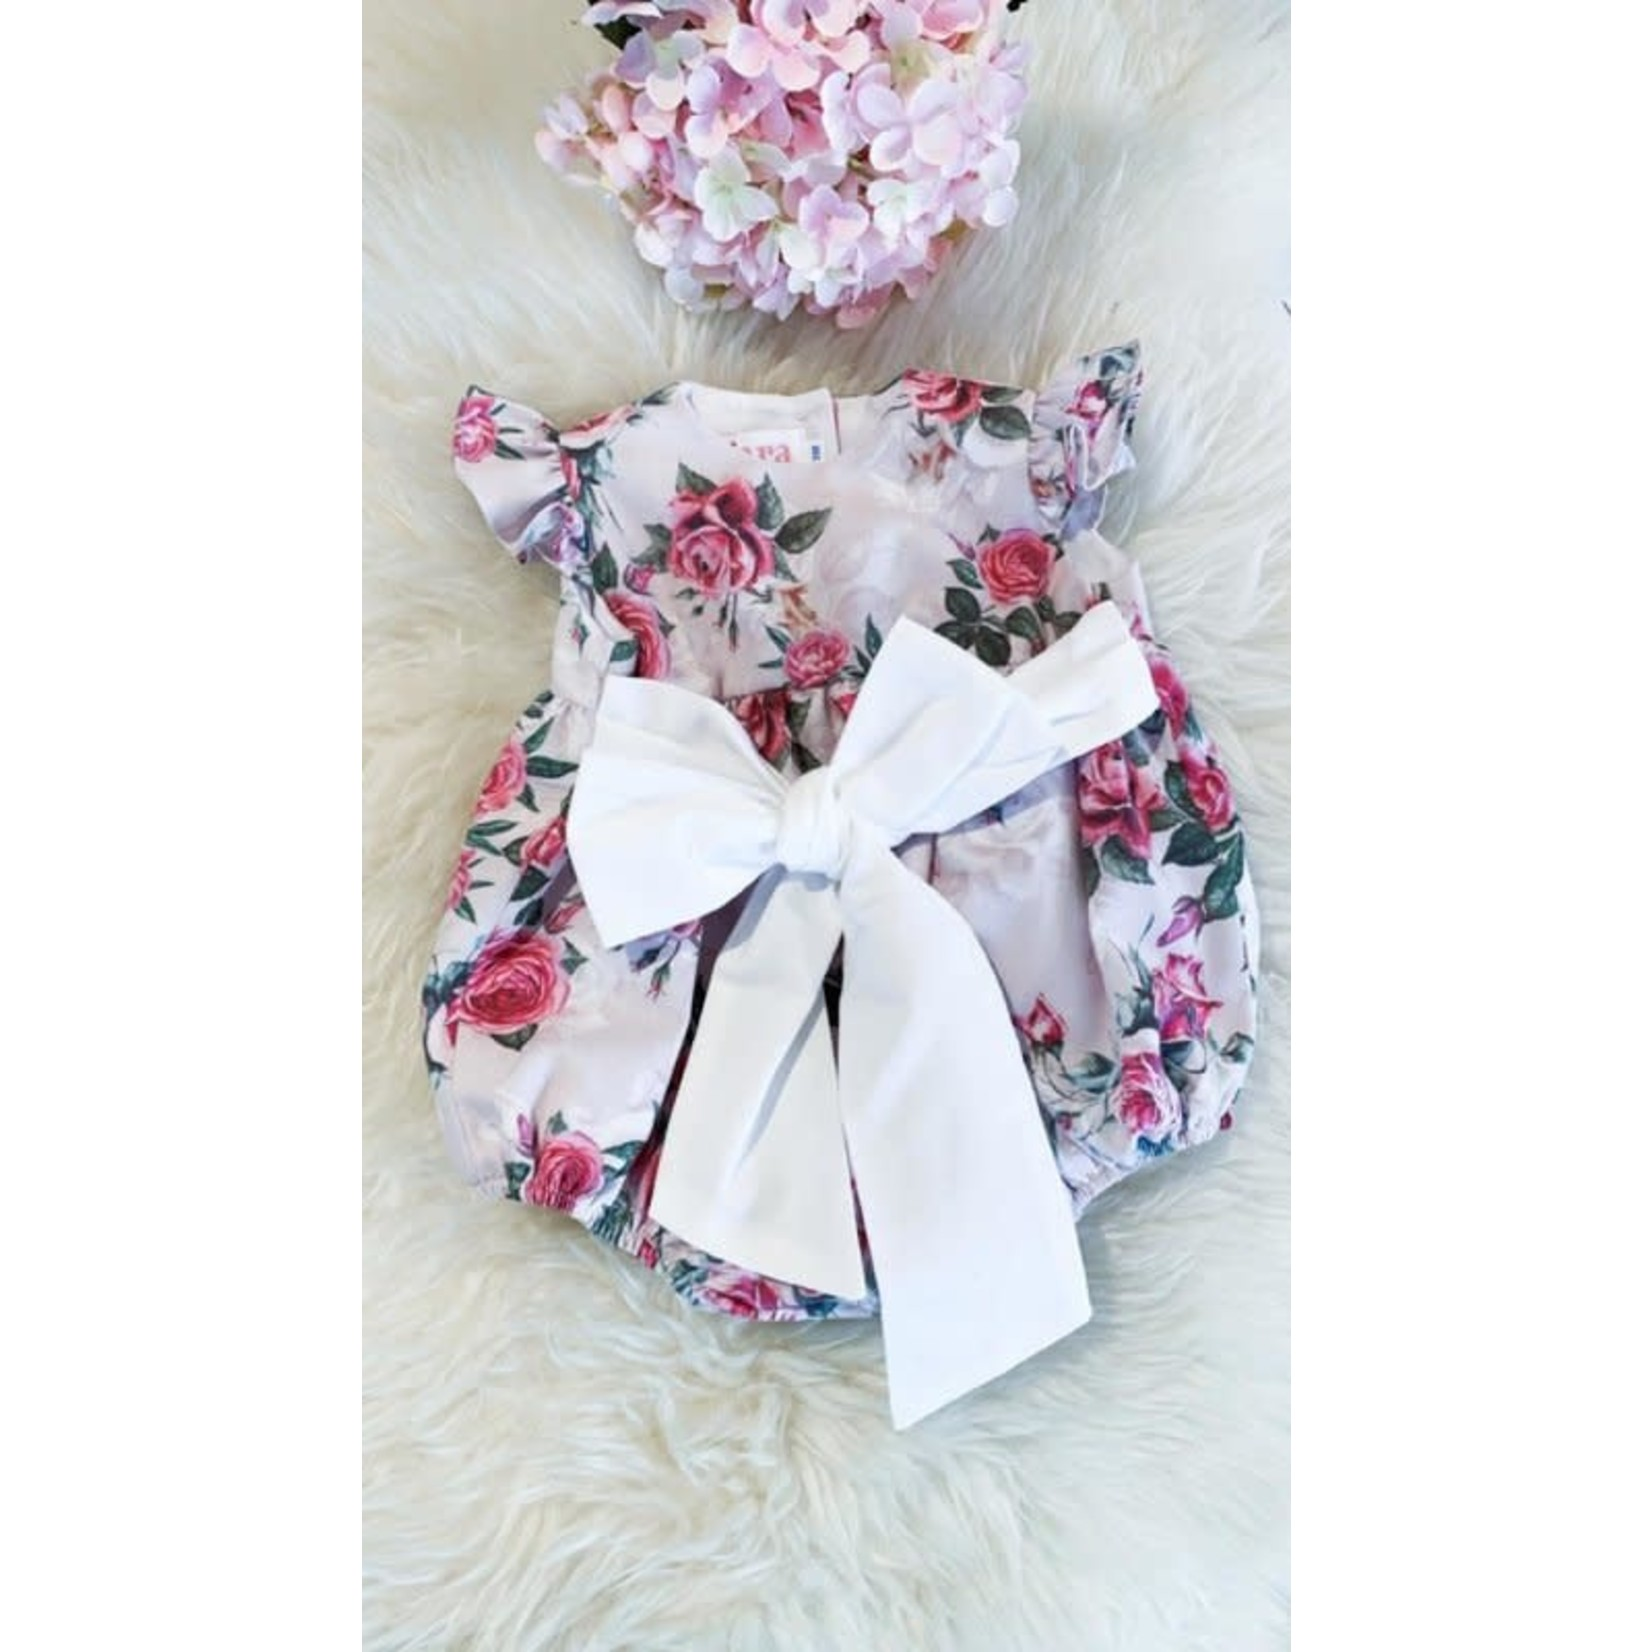 Petite Zara Romper Iris - Petite Zara Label